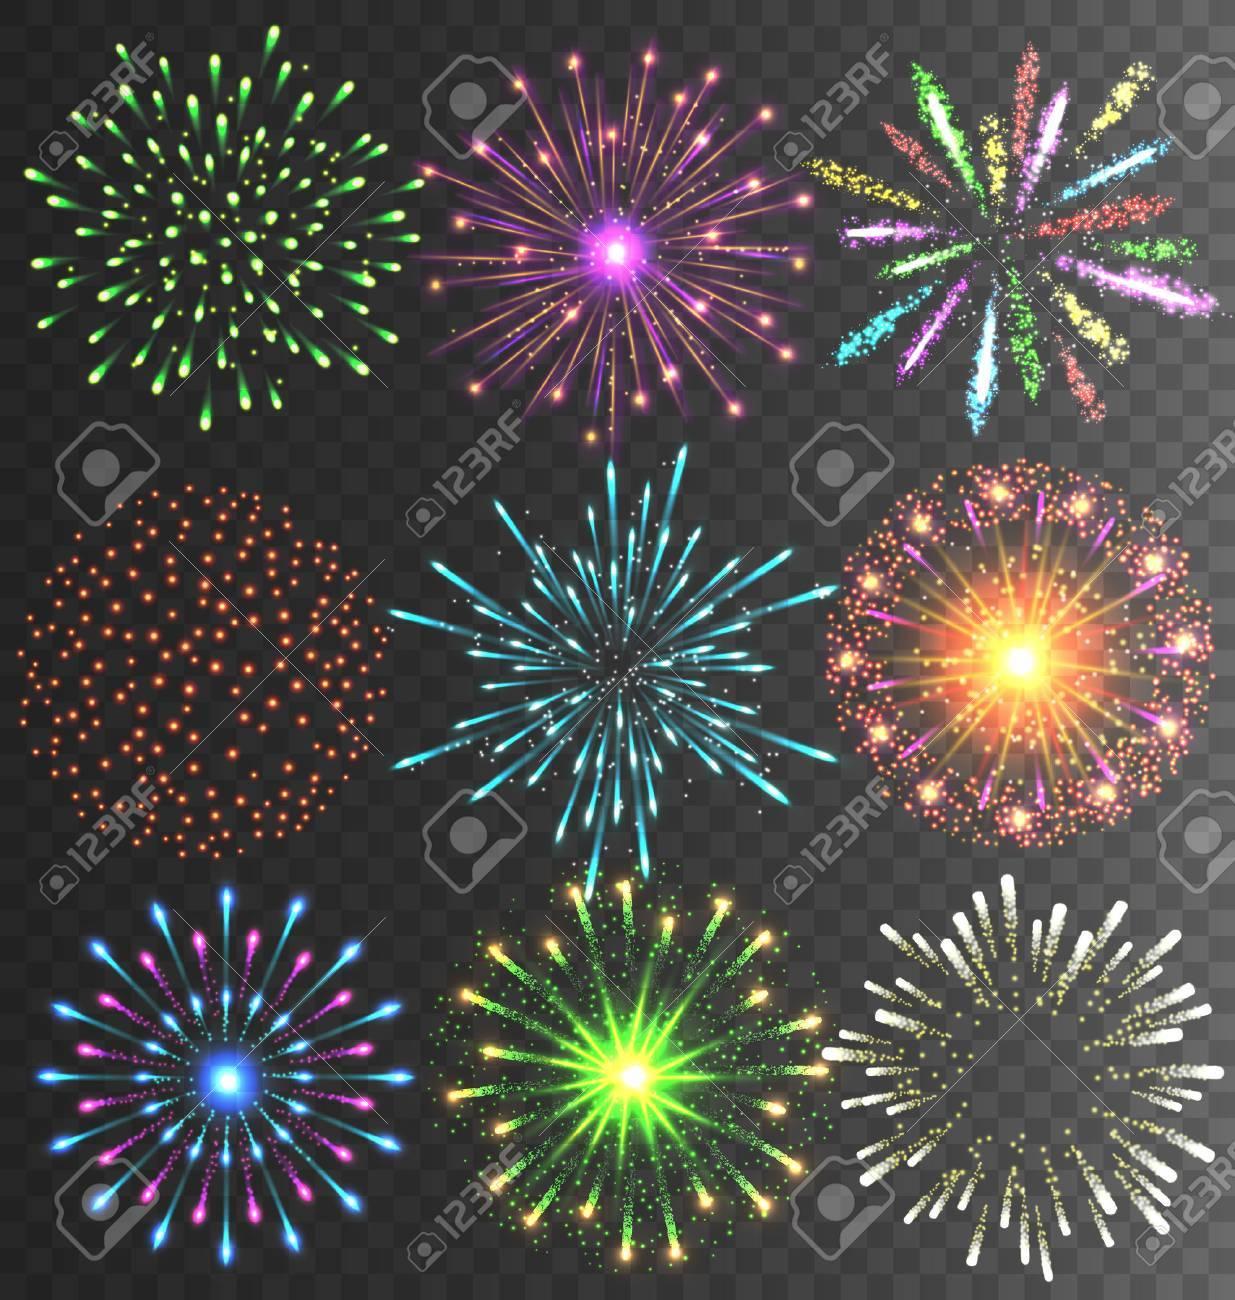 Festive Colorful Bright Firework Salute Burst on Transparent Background - 47163485